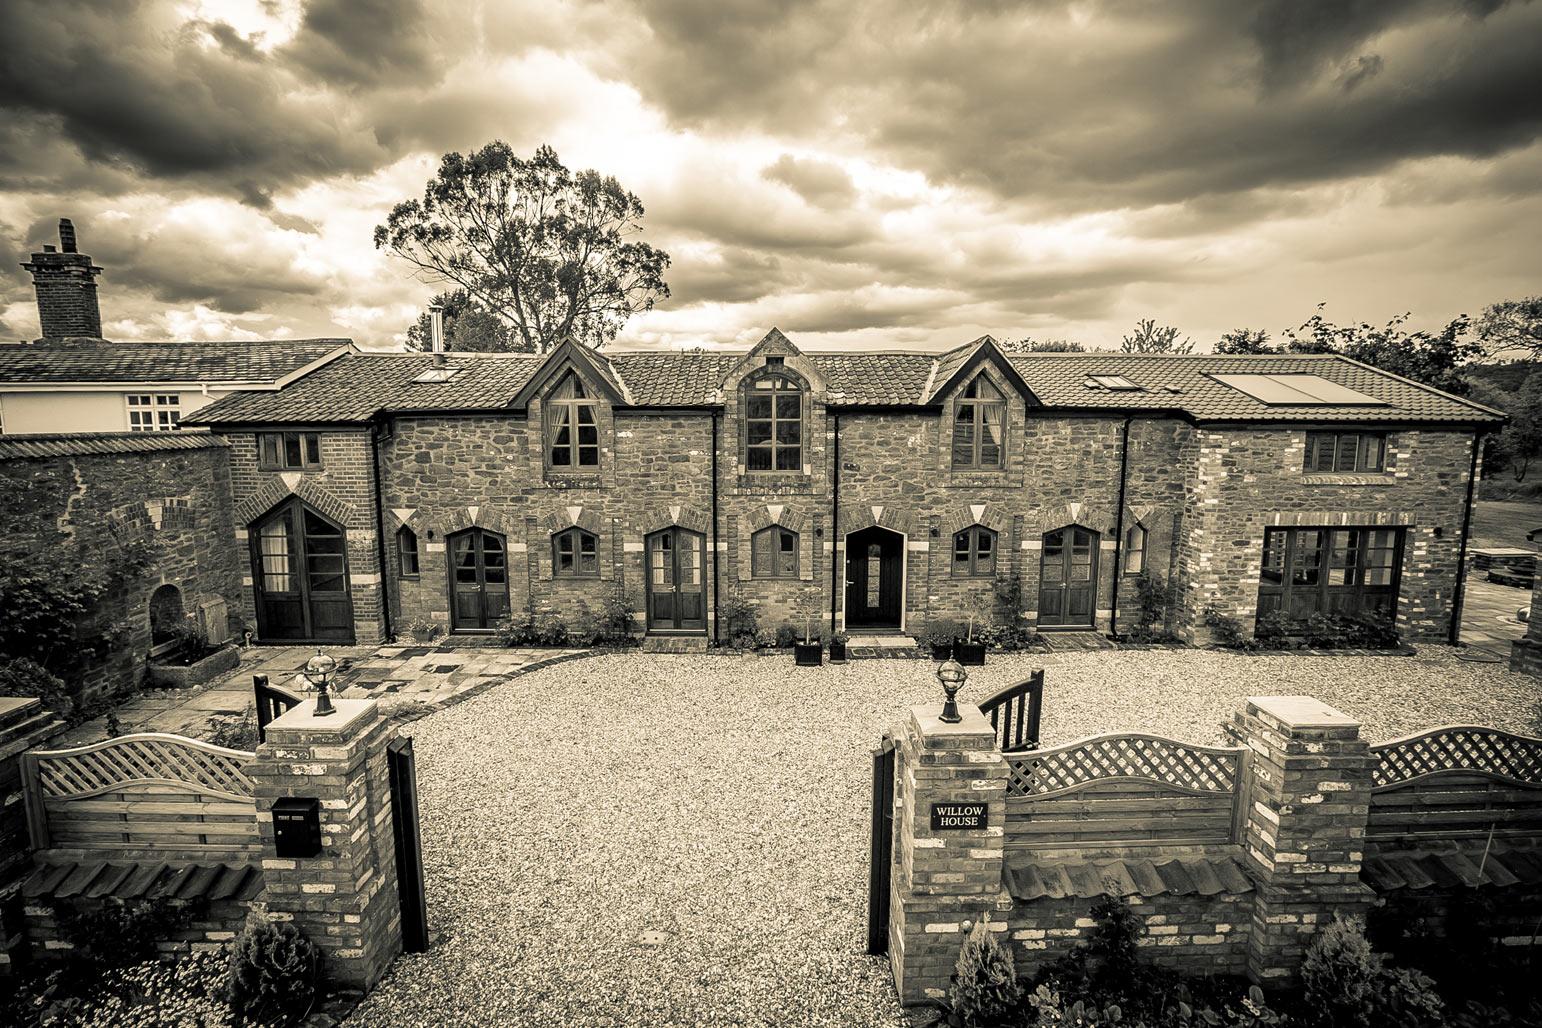 willow-house-15.jpg